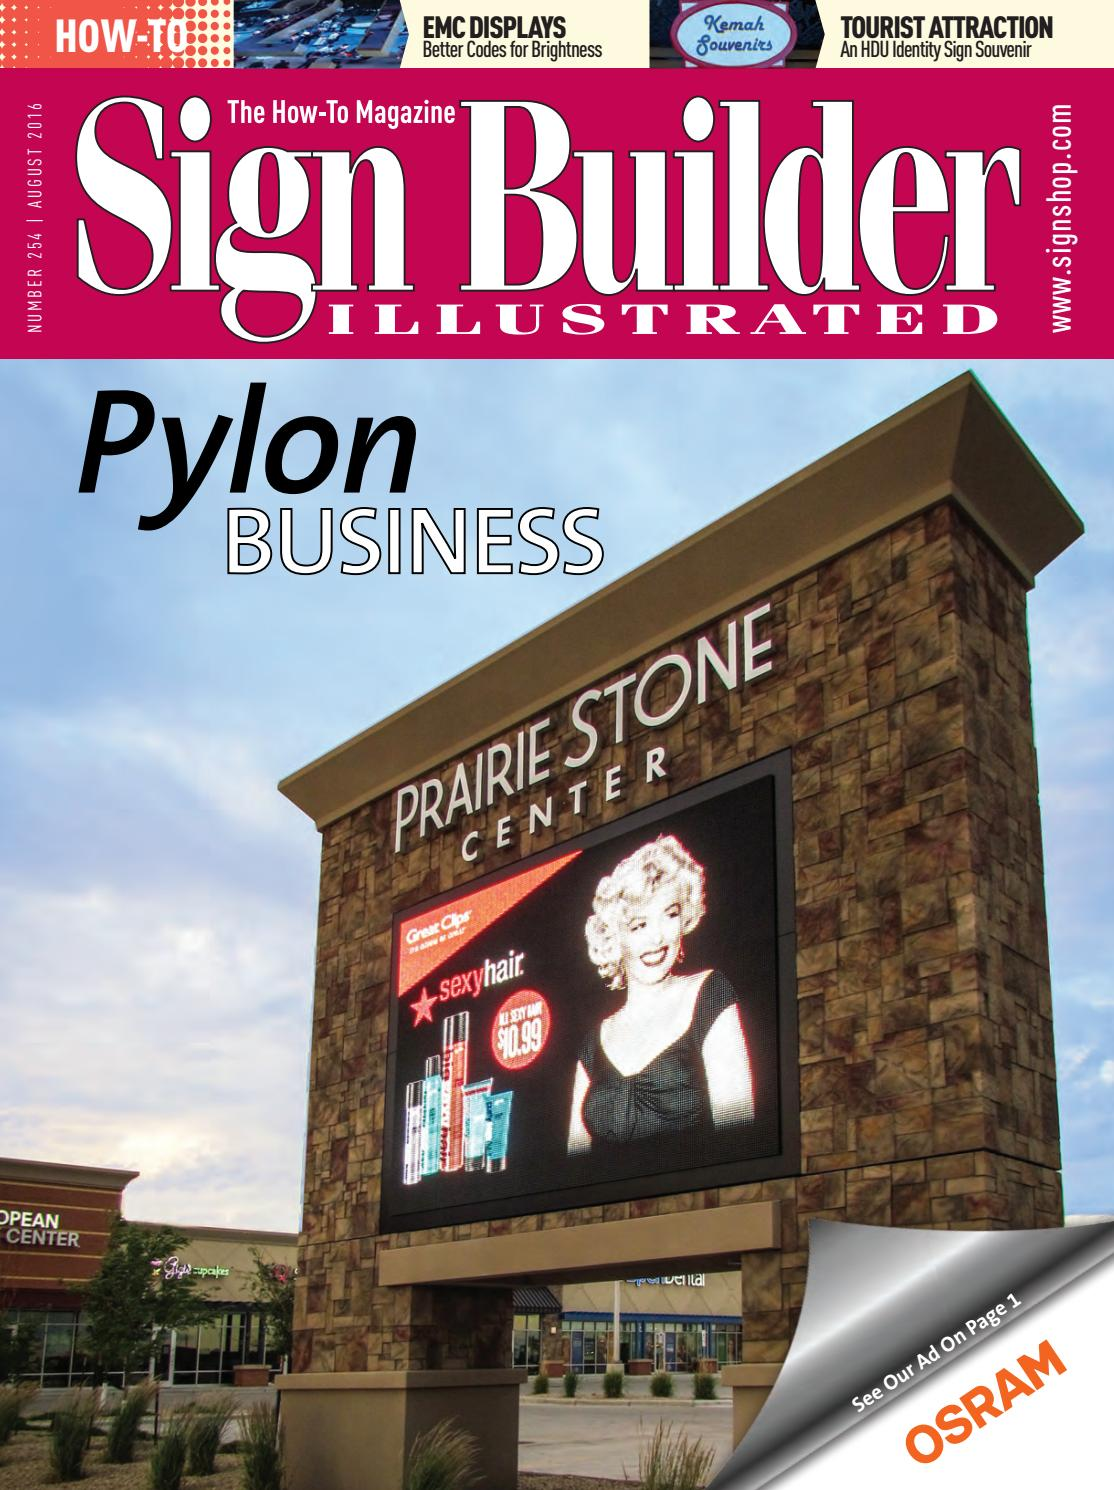 Turn key sign design sign manufacturing sign installation and sign - Sign Builder Illustrated August 2016 By Sign Builder Illustrated Issuu